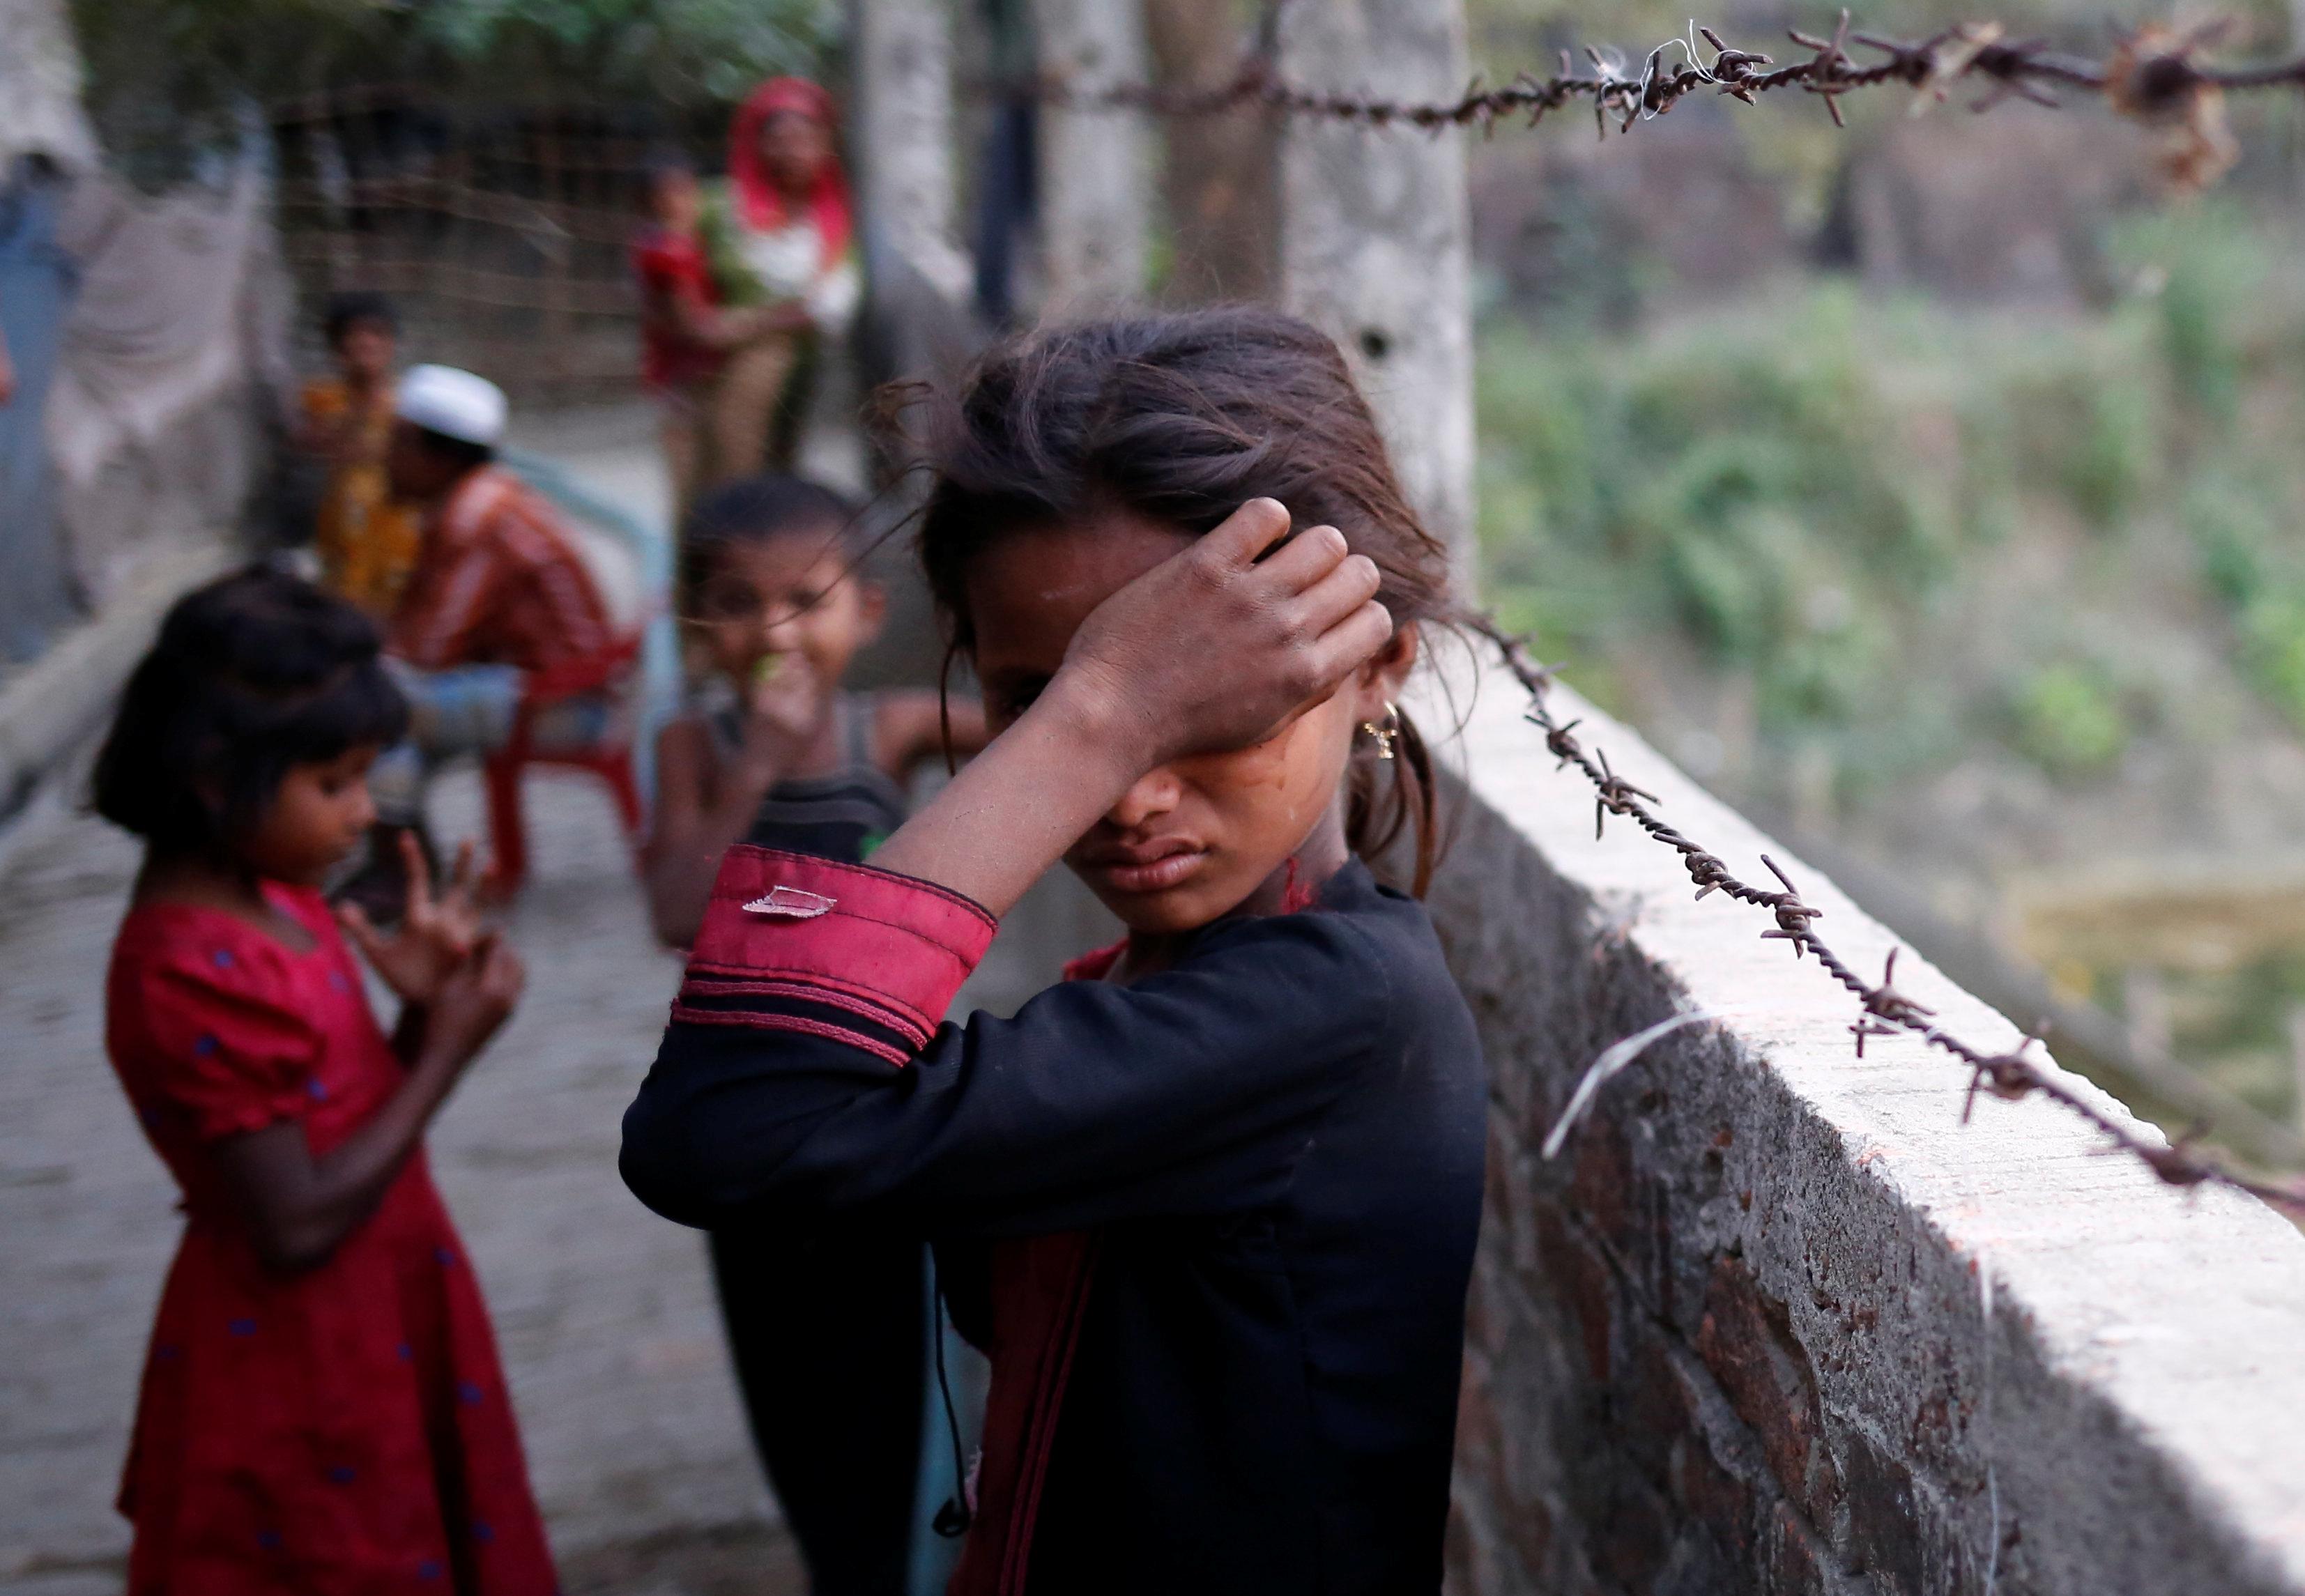 A refugee girl